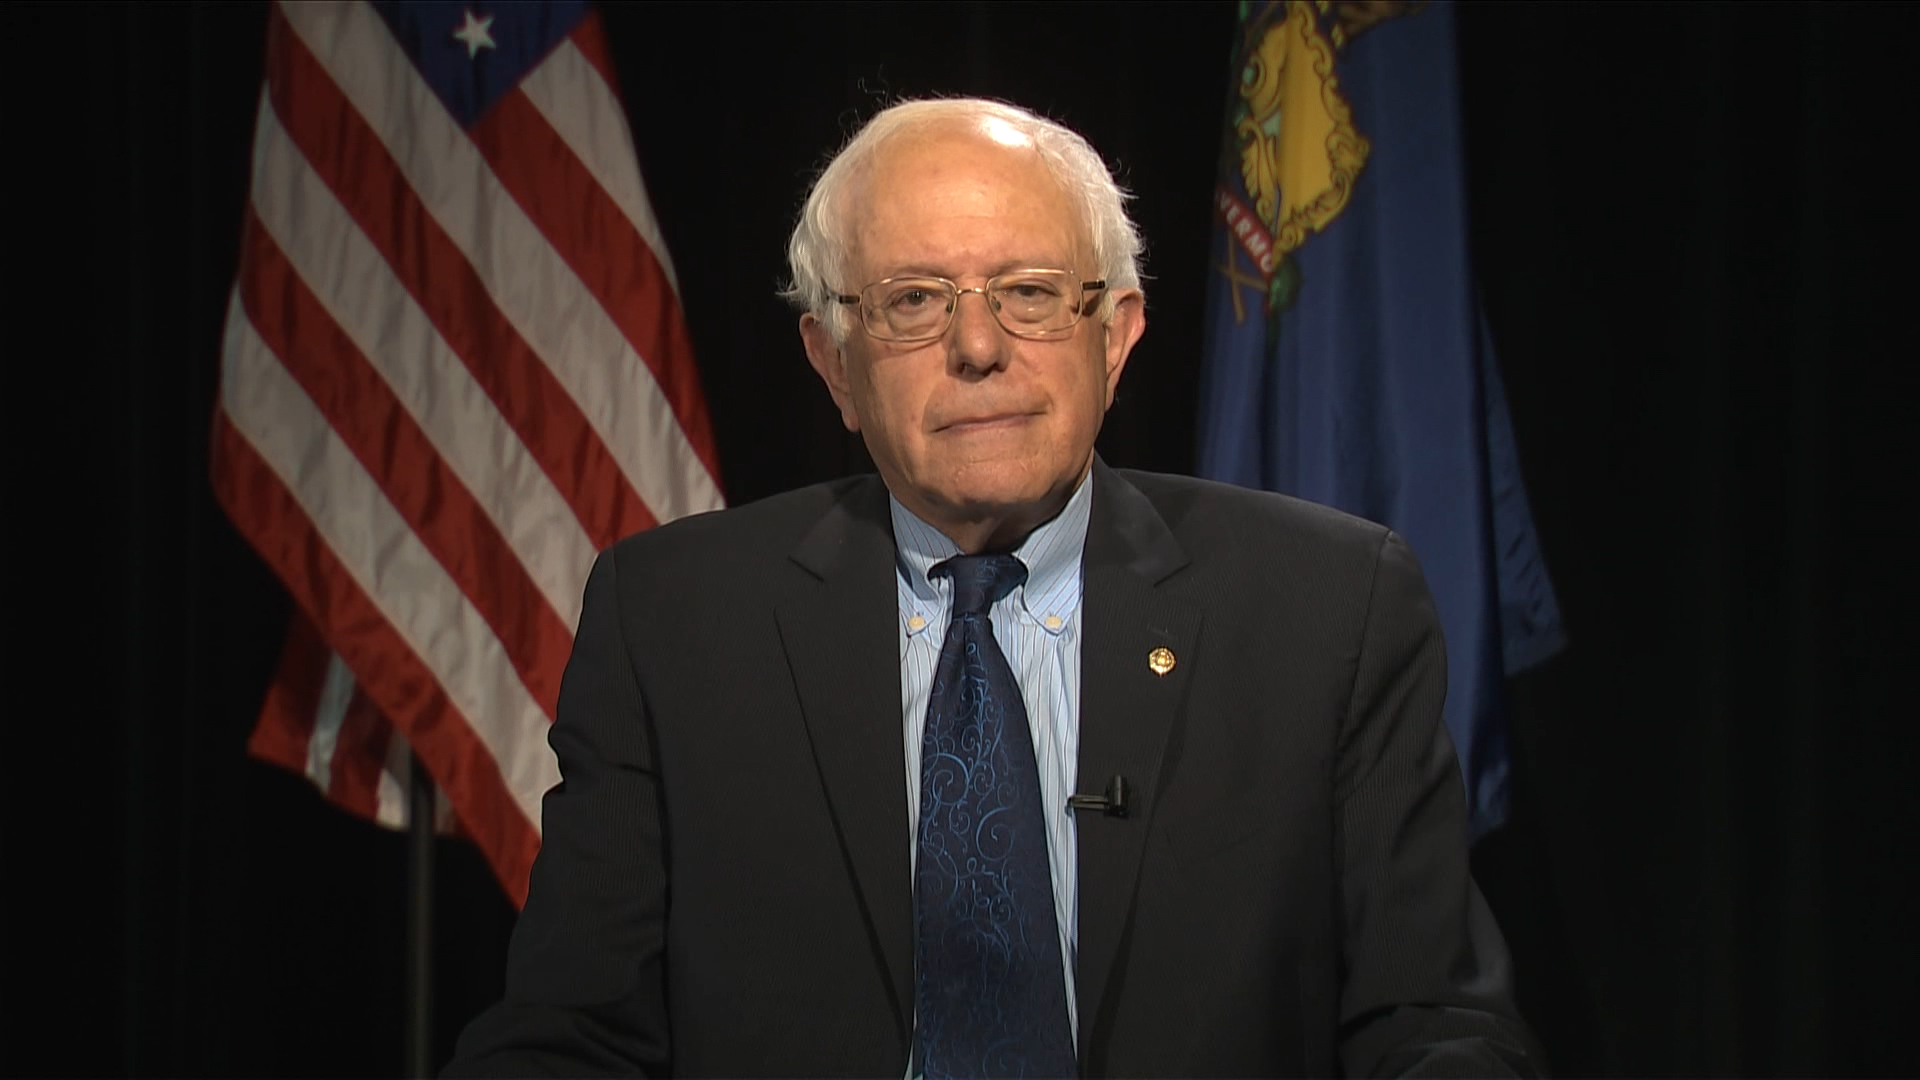 Sanders to introduce VA accountability bill